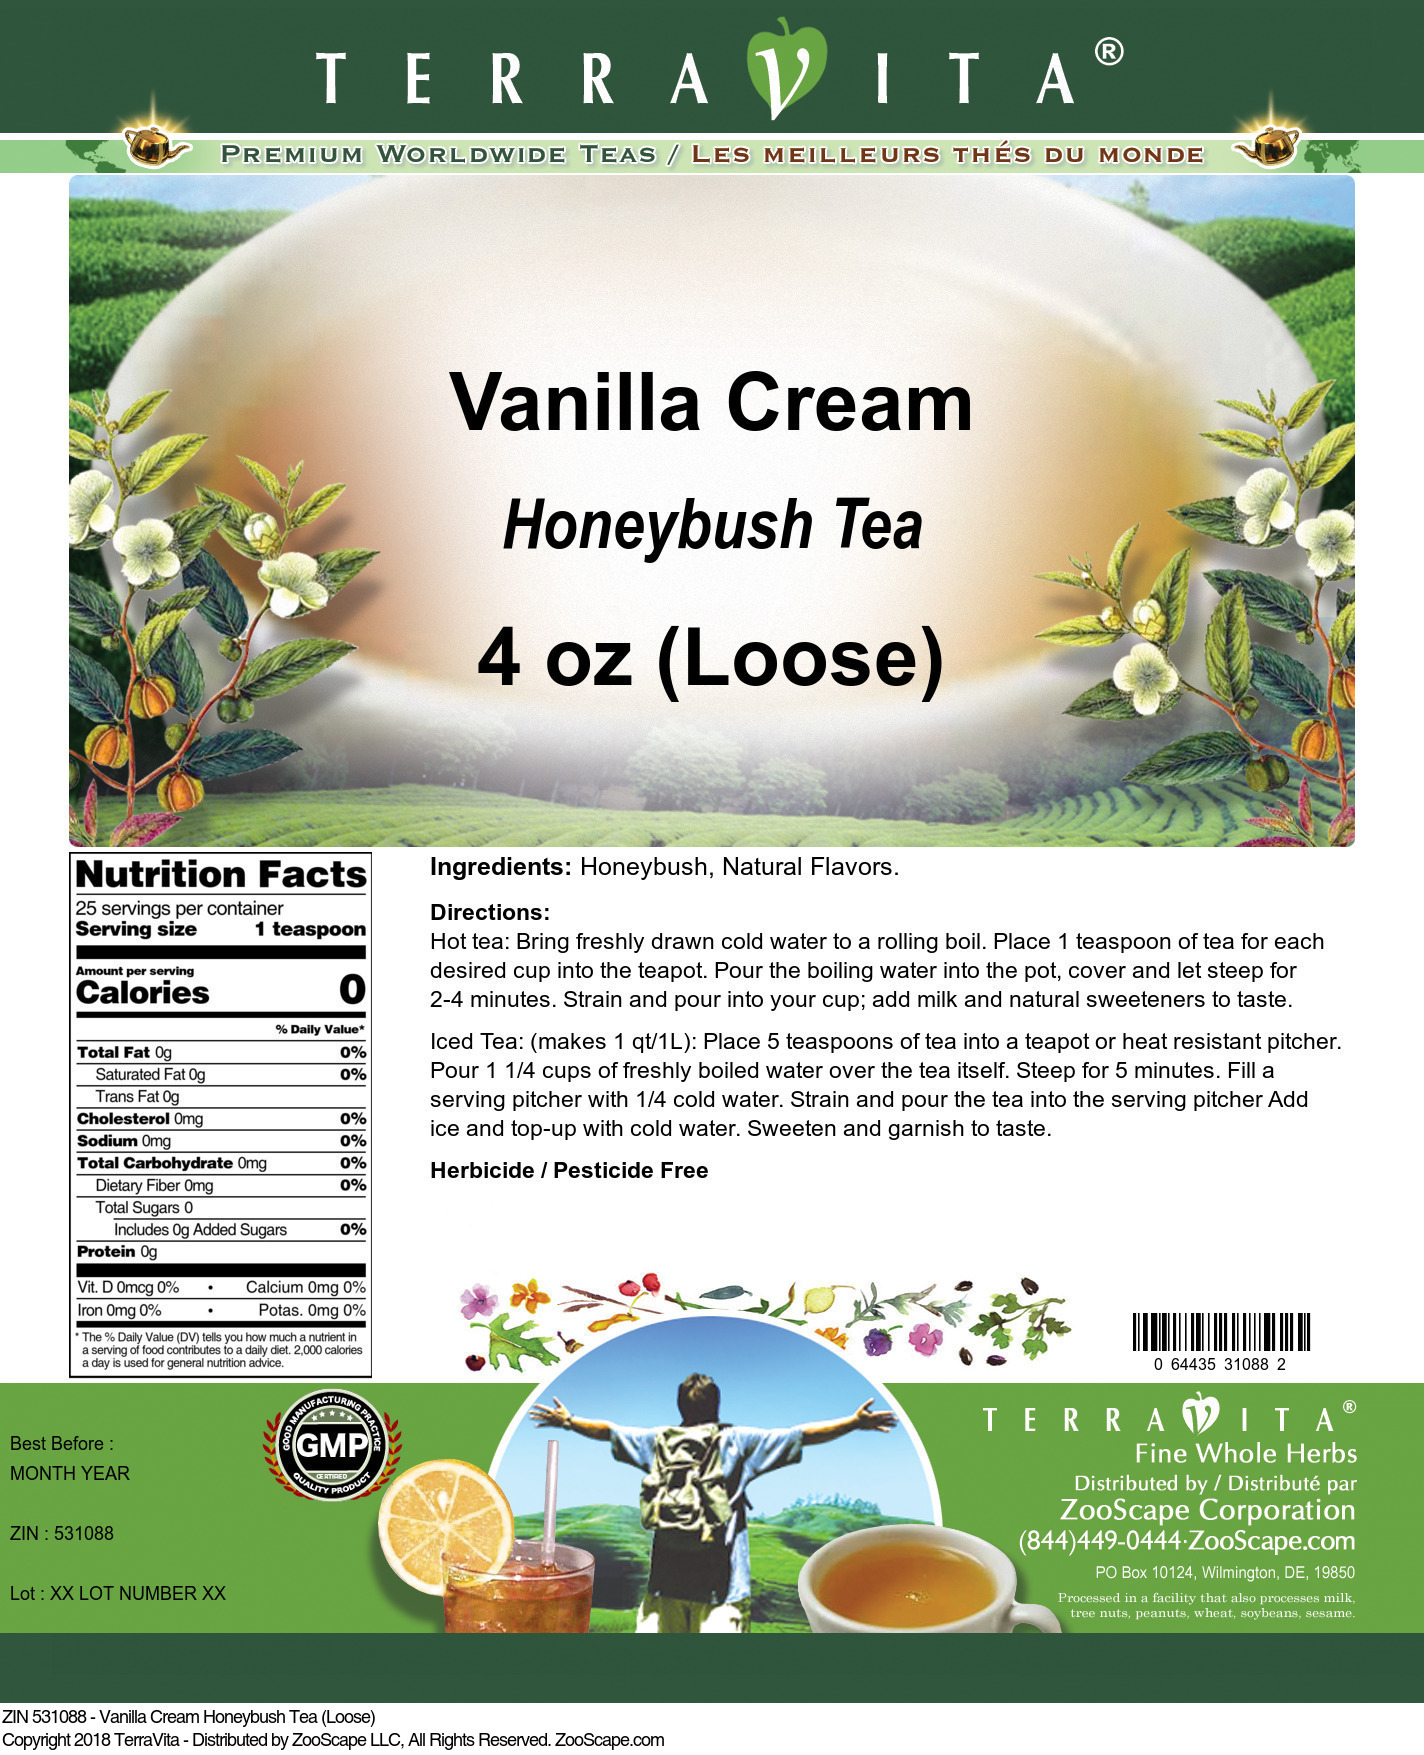 Vanilla Cream Honeybush Tea (Loose)